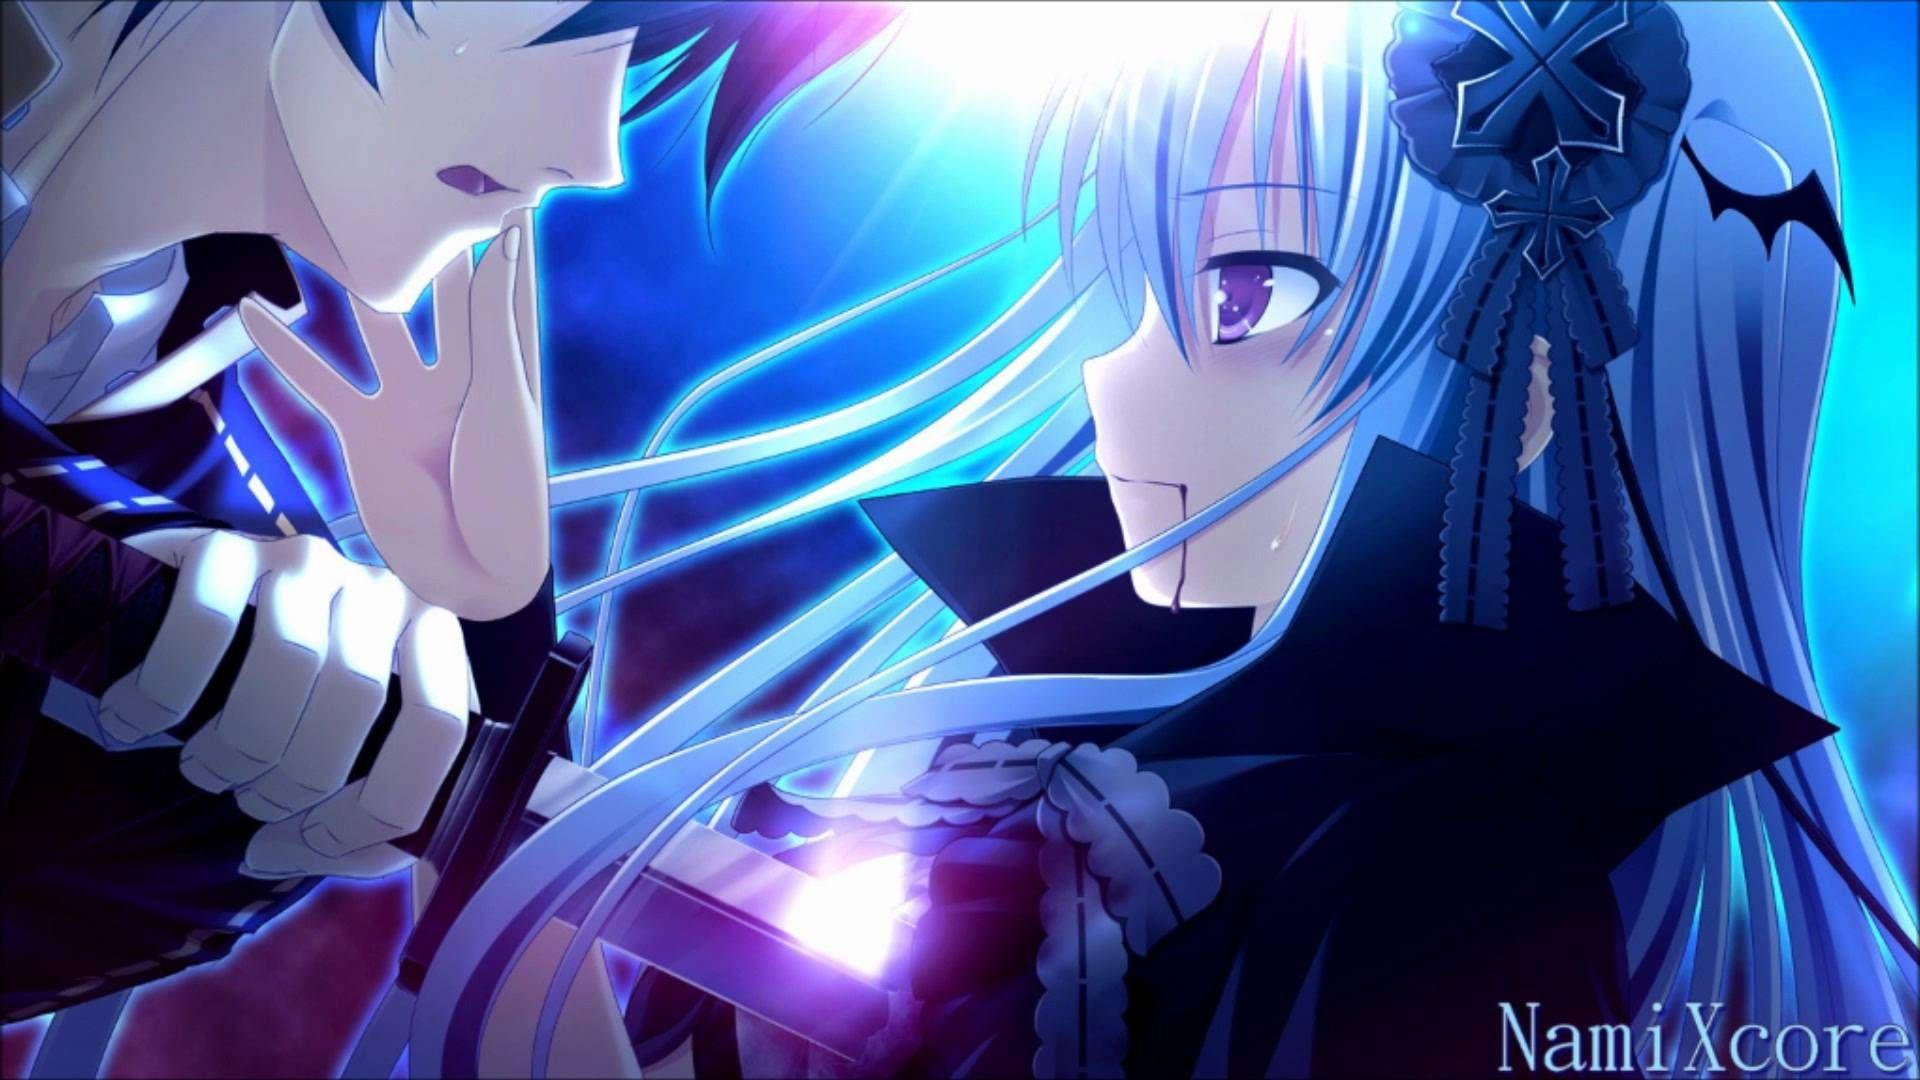 Nightcore Grenade Playlist Hd Anime Wallpapers Cute Anime Wallpaper Anime